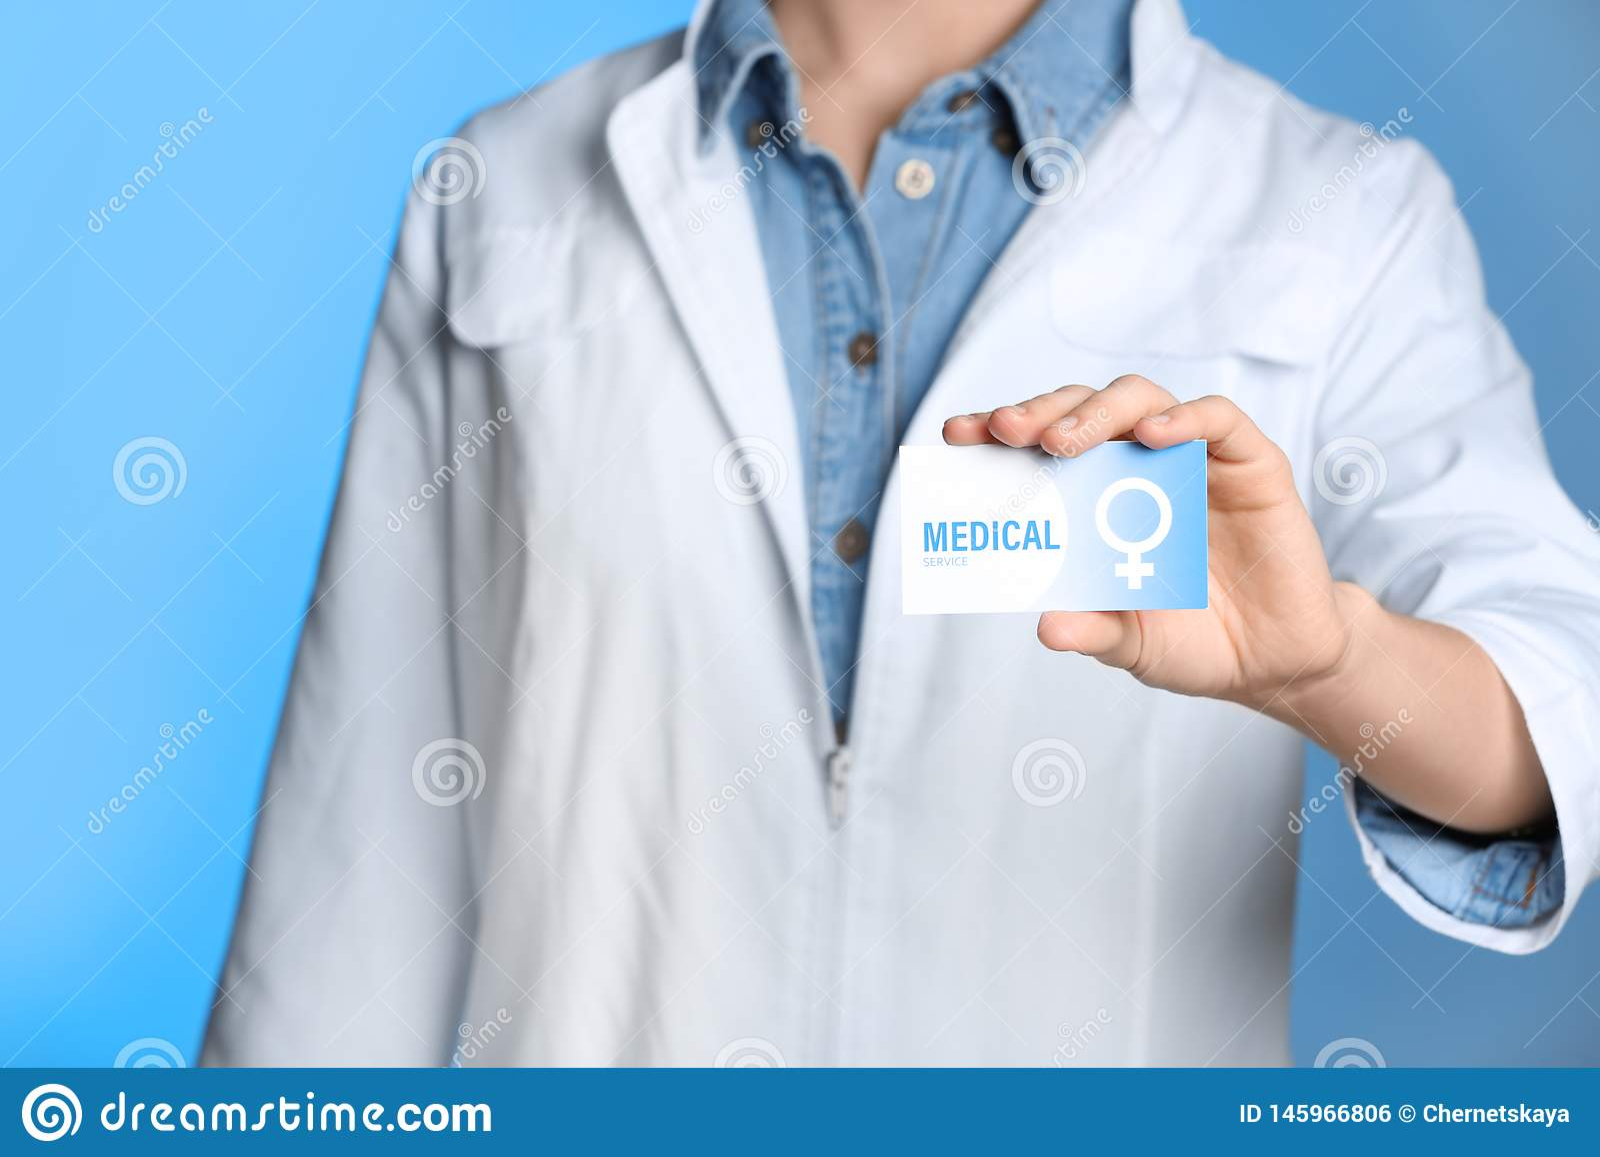 Doctor Holding Medical Business Card On Color Background